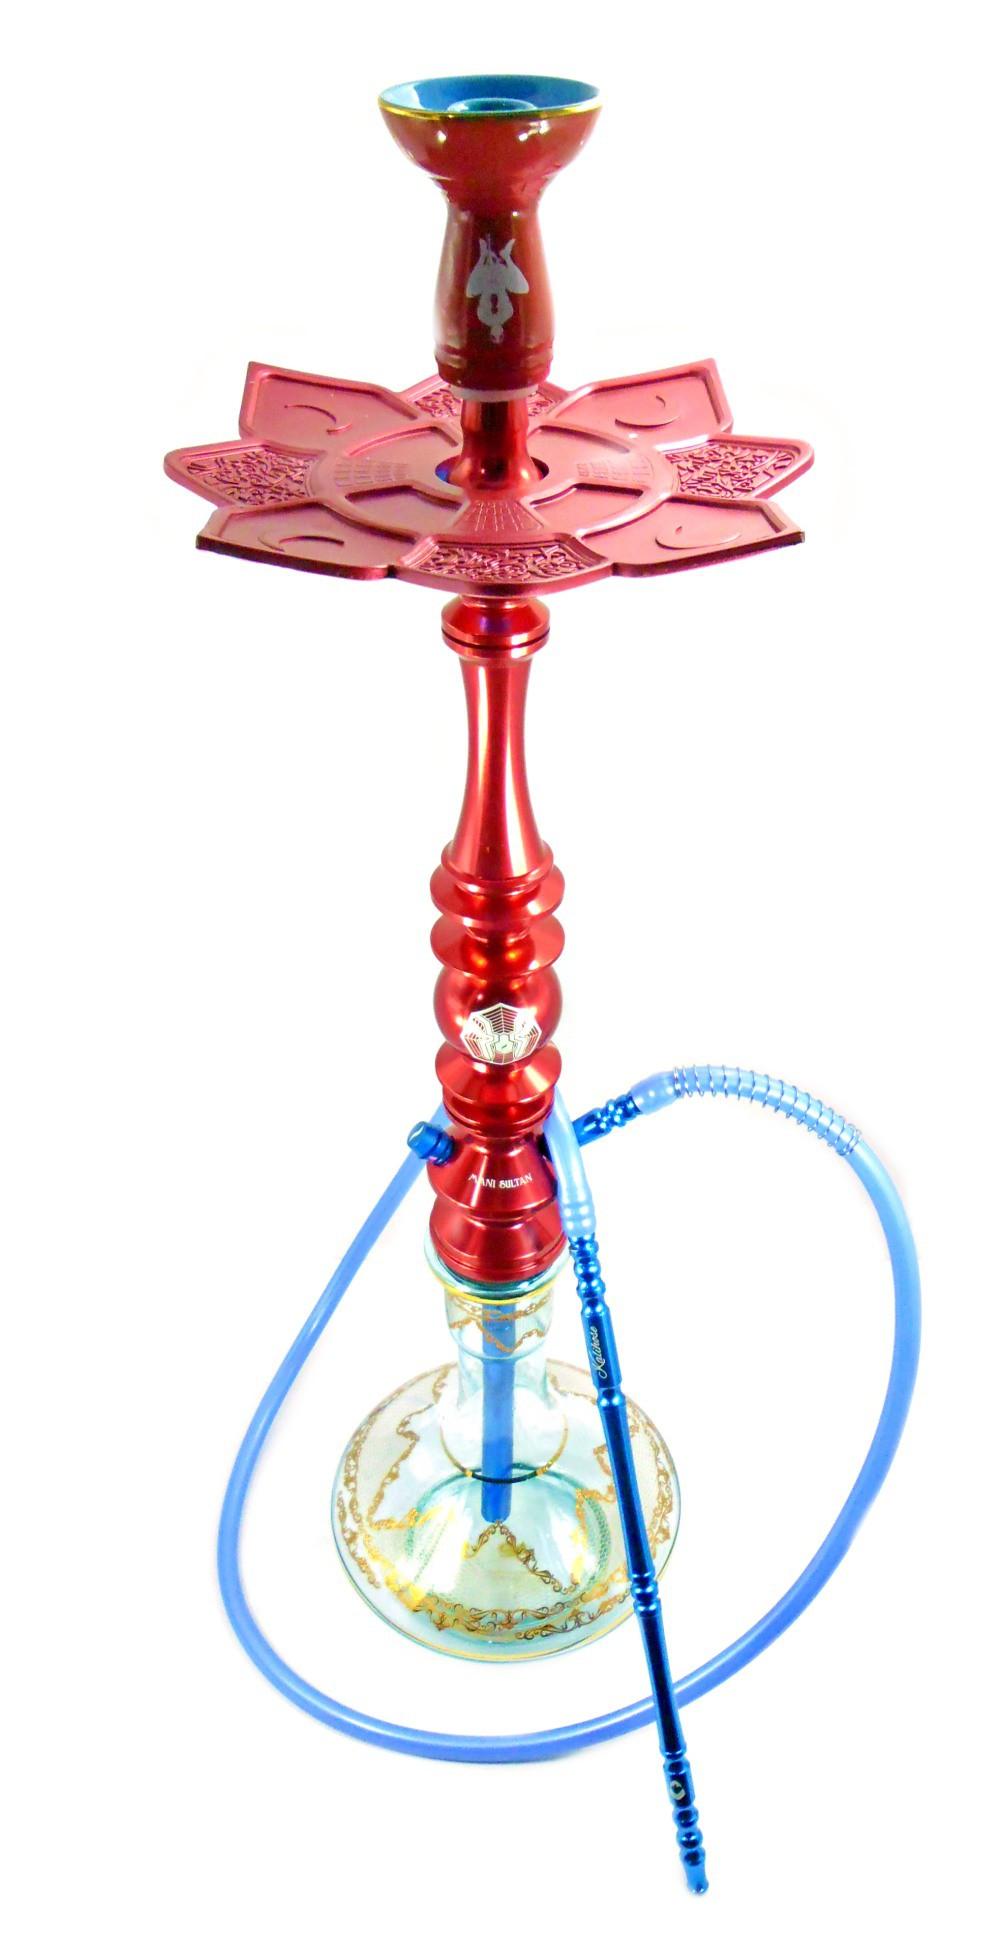 Narguile Mani Sultan SPYDER MANI 85cm, vaso Aladin, mang. silicone, piteira de alumínio, rosh HOMEM ARANHA, prato MOON